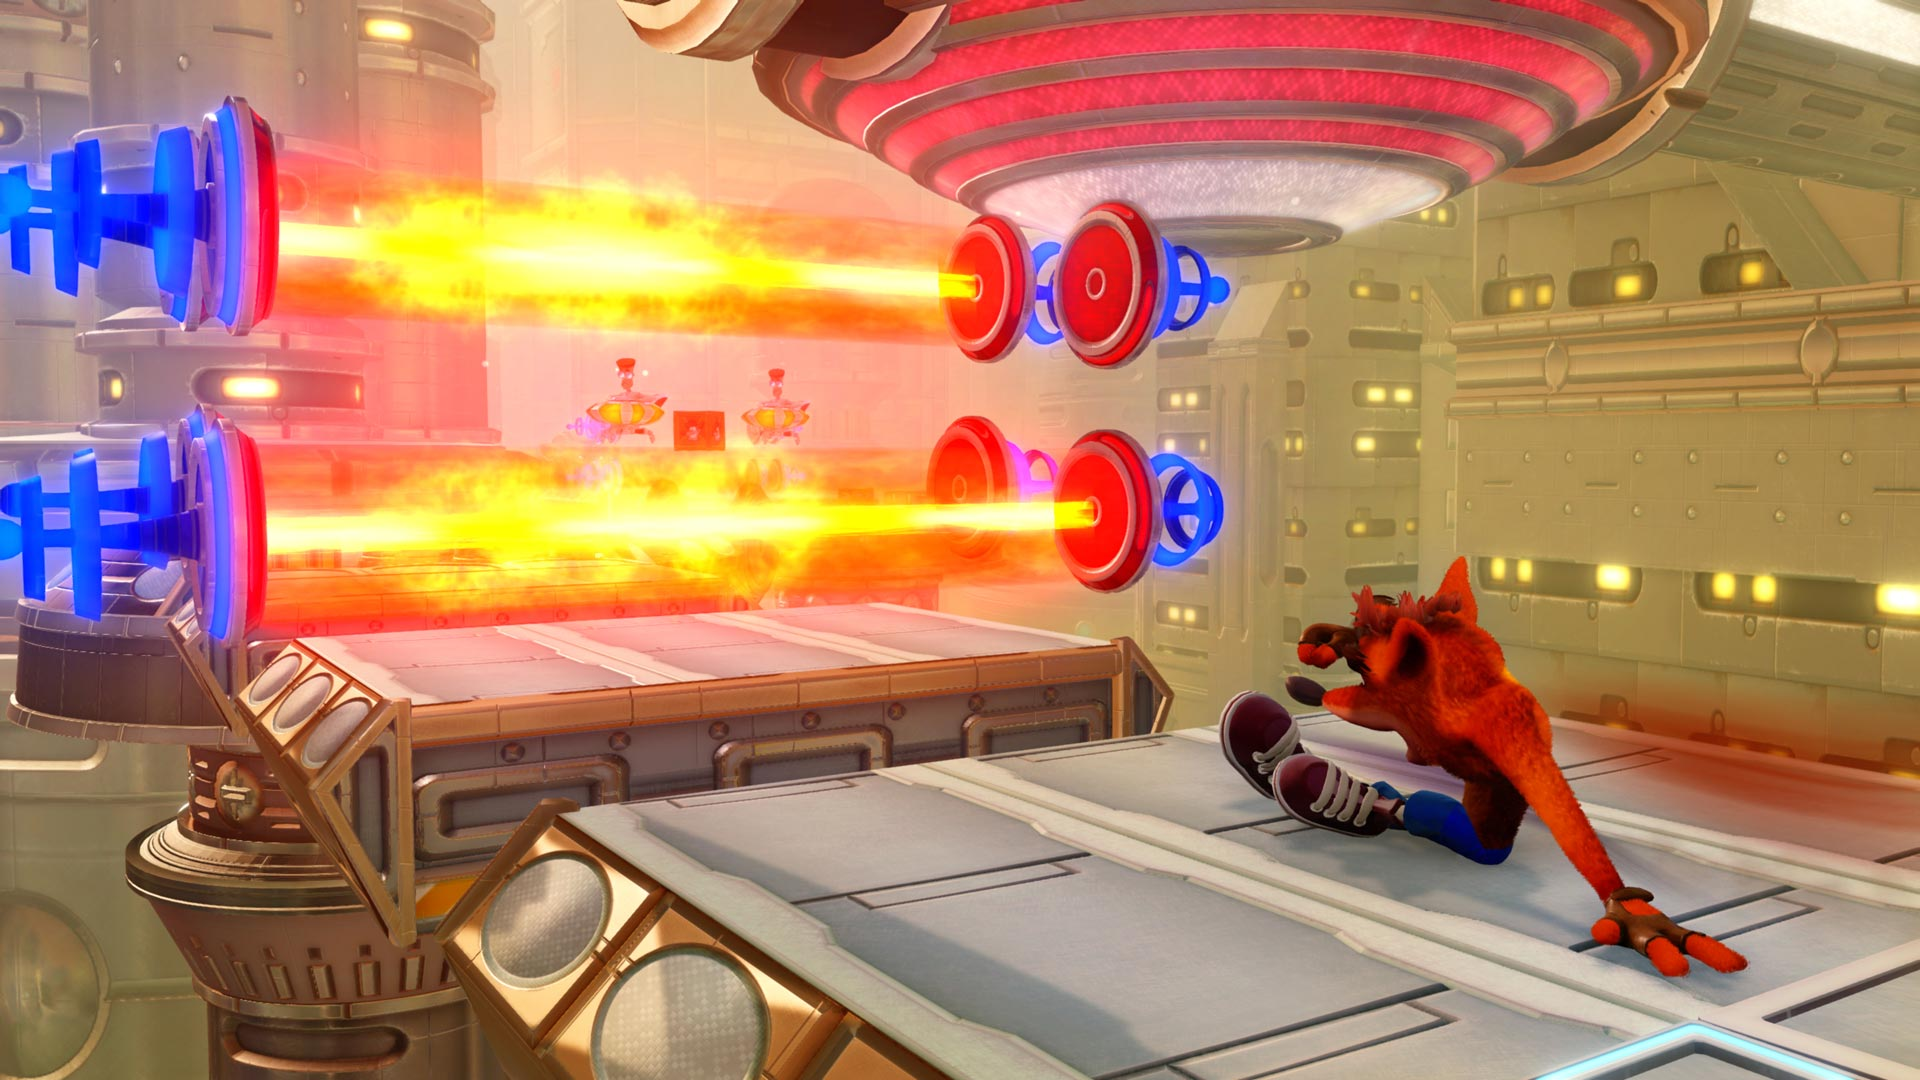 Скриншот №5 к Crash Bandicoot N. Sane Trilogy - эпизод Future Tense